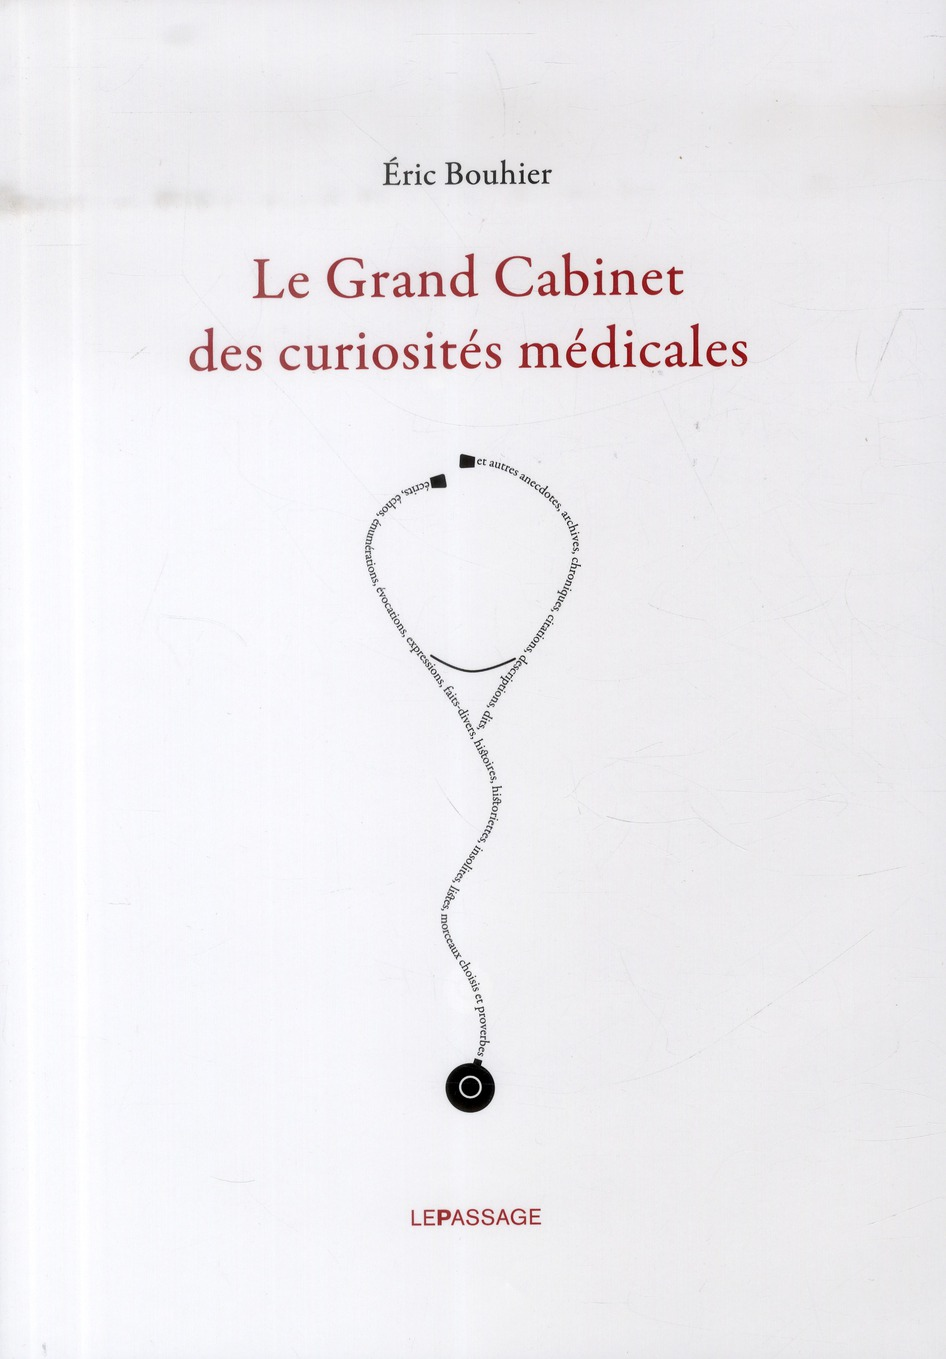 LE GRAND CABINET DES CURIOSITES MEDICALES